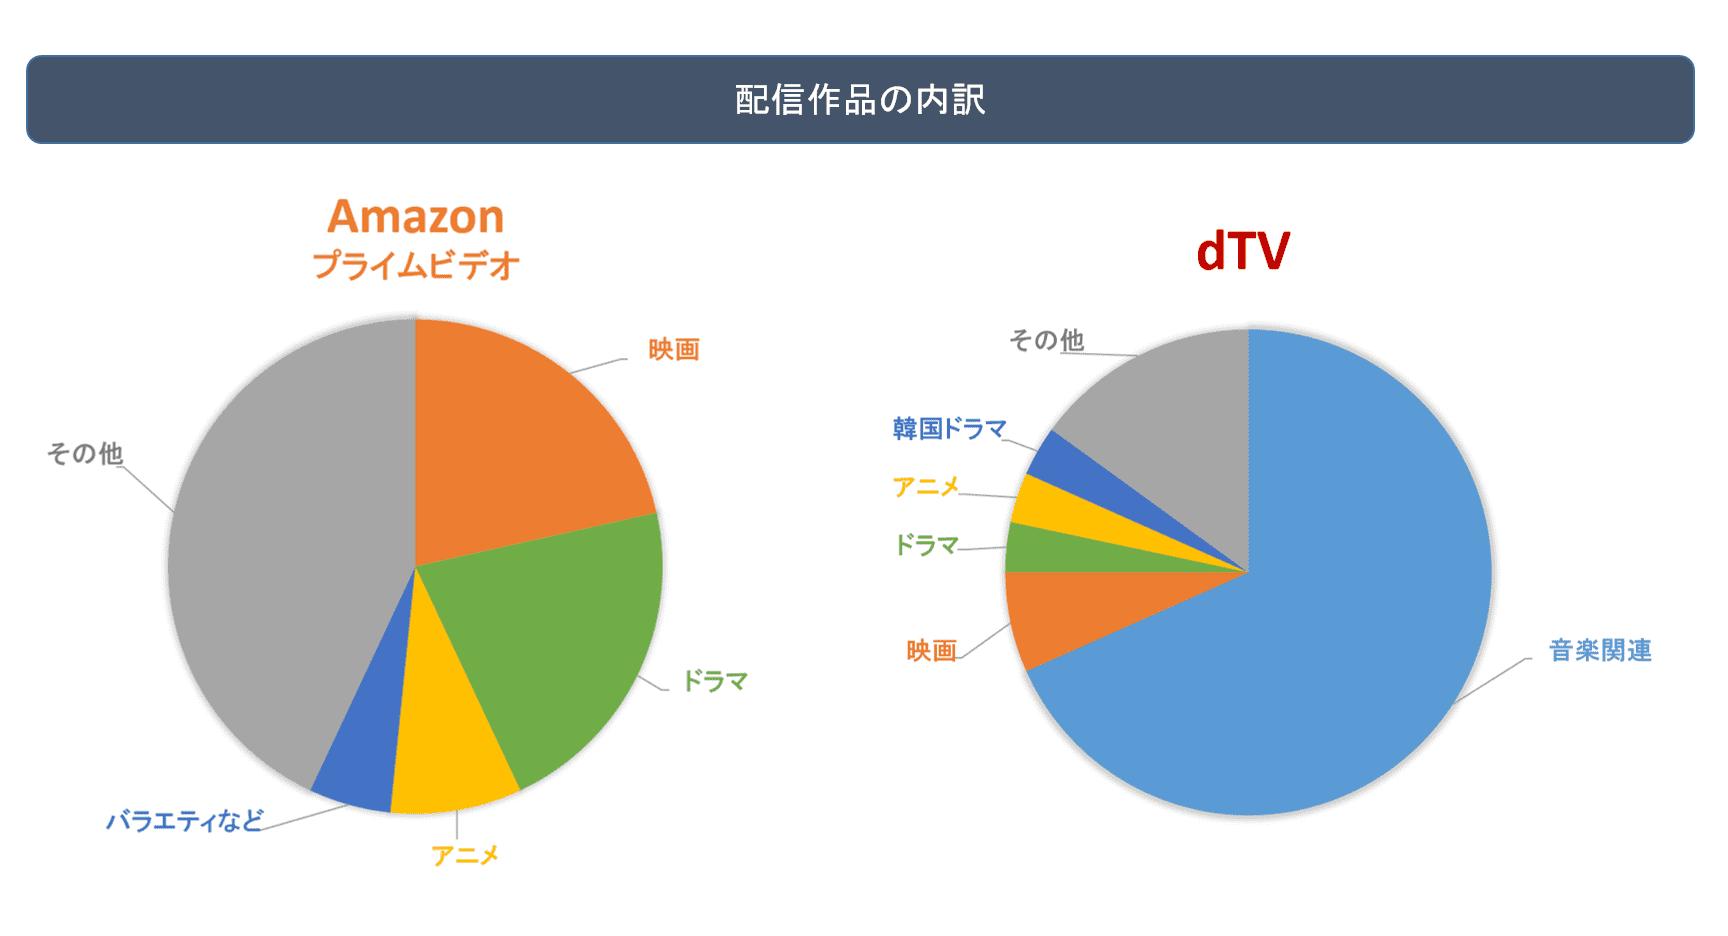 dTVとアマプラ配信作品の内訳 図解